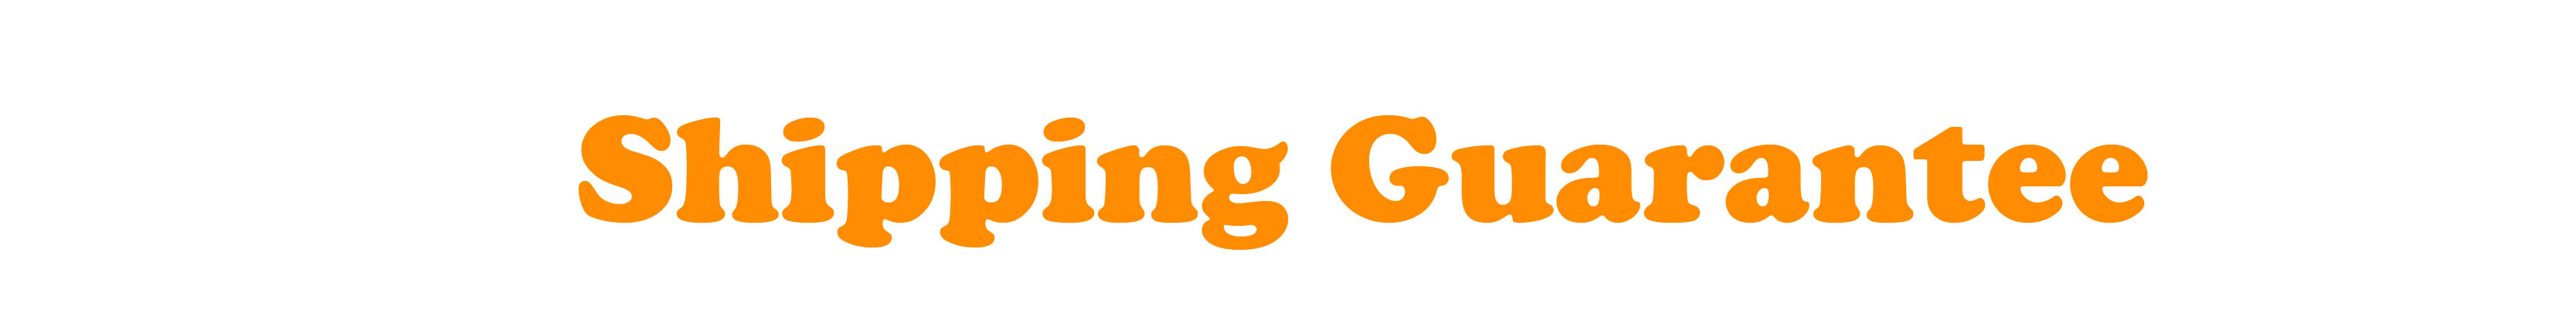 Titles_Shipping Guarantee